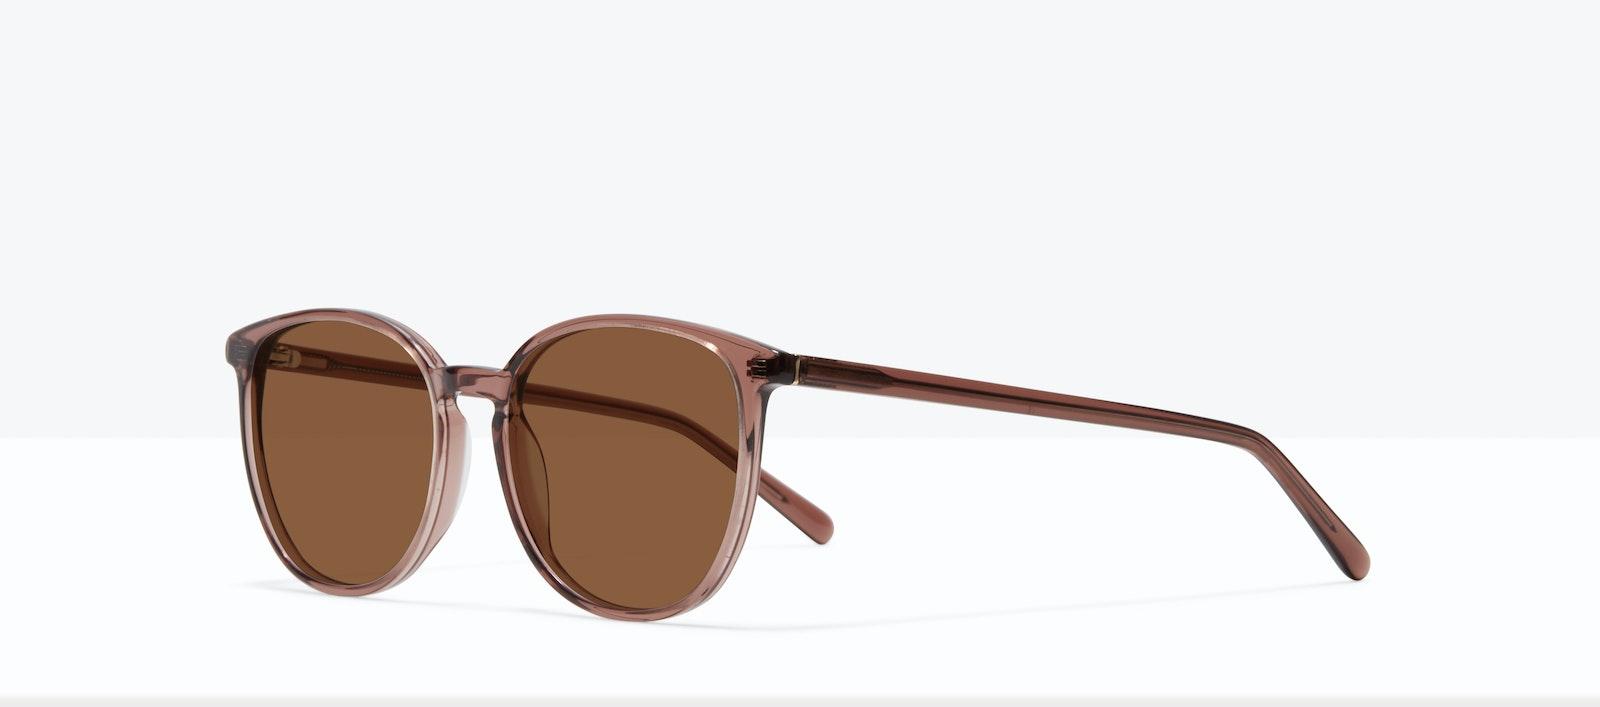 Affordable Fashion Glasses Round Sunglasses Women Femme Libre S Catherine Tilt